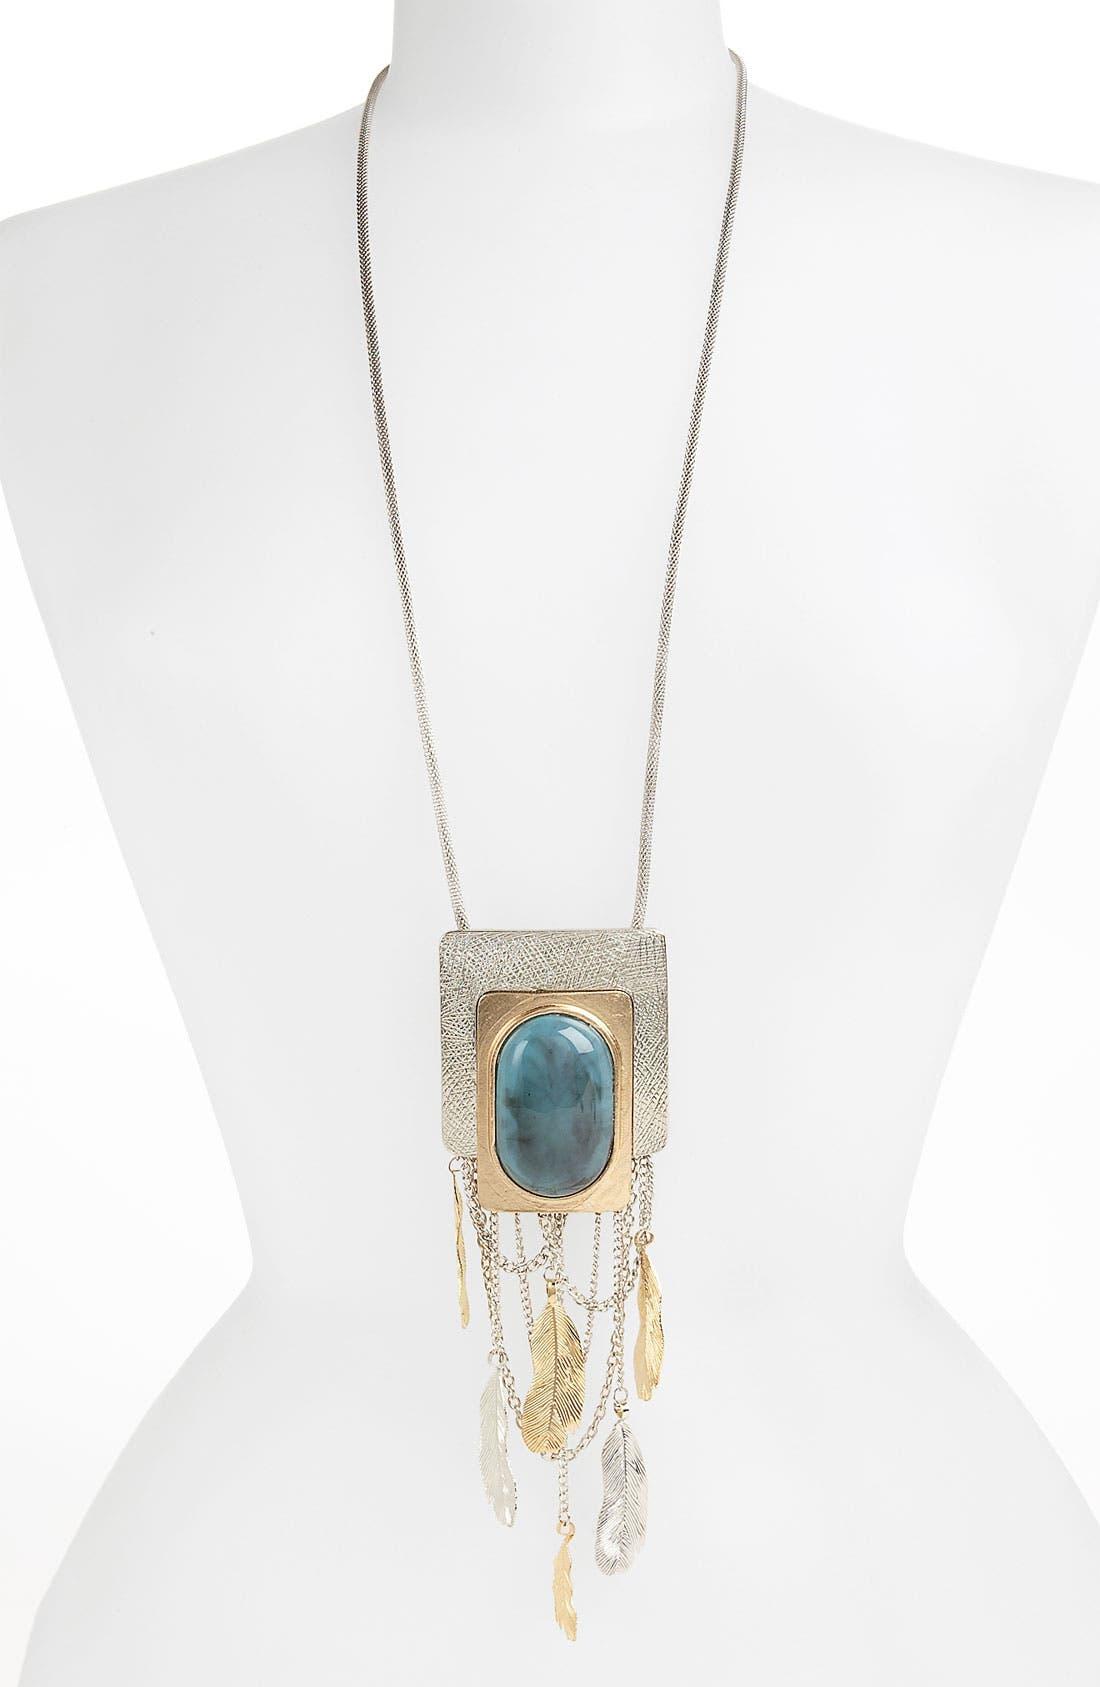 Alternate Image 1 Selected - Natasha Couture 'Deco Hippie' Pendant Necklace